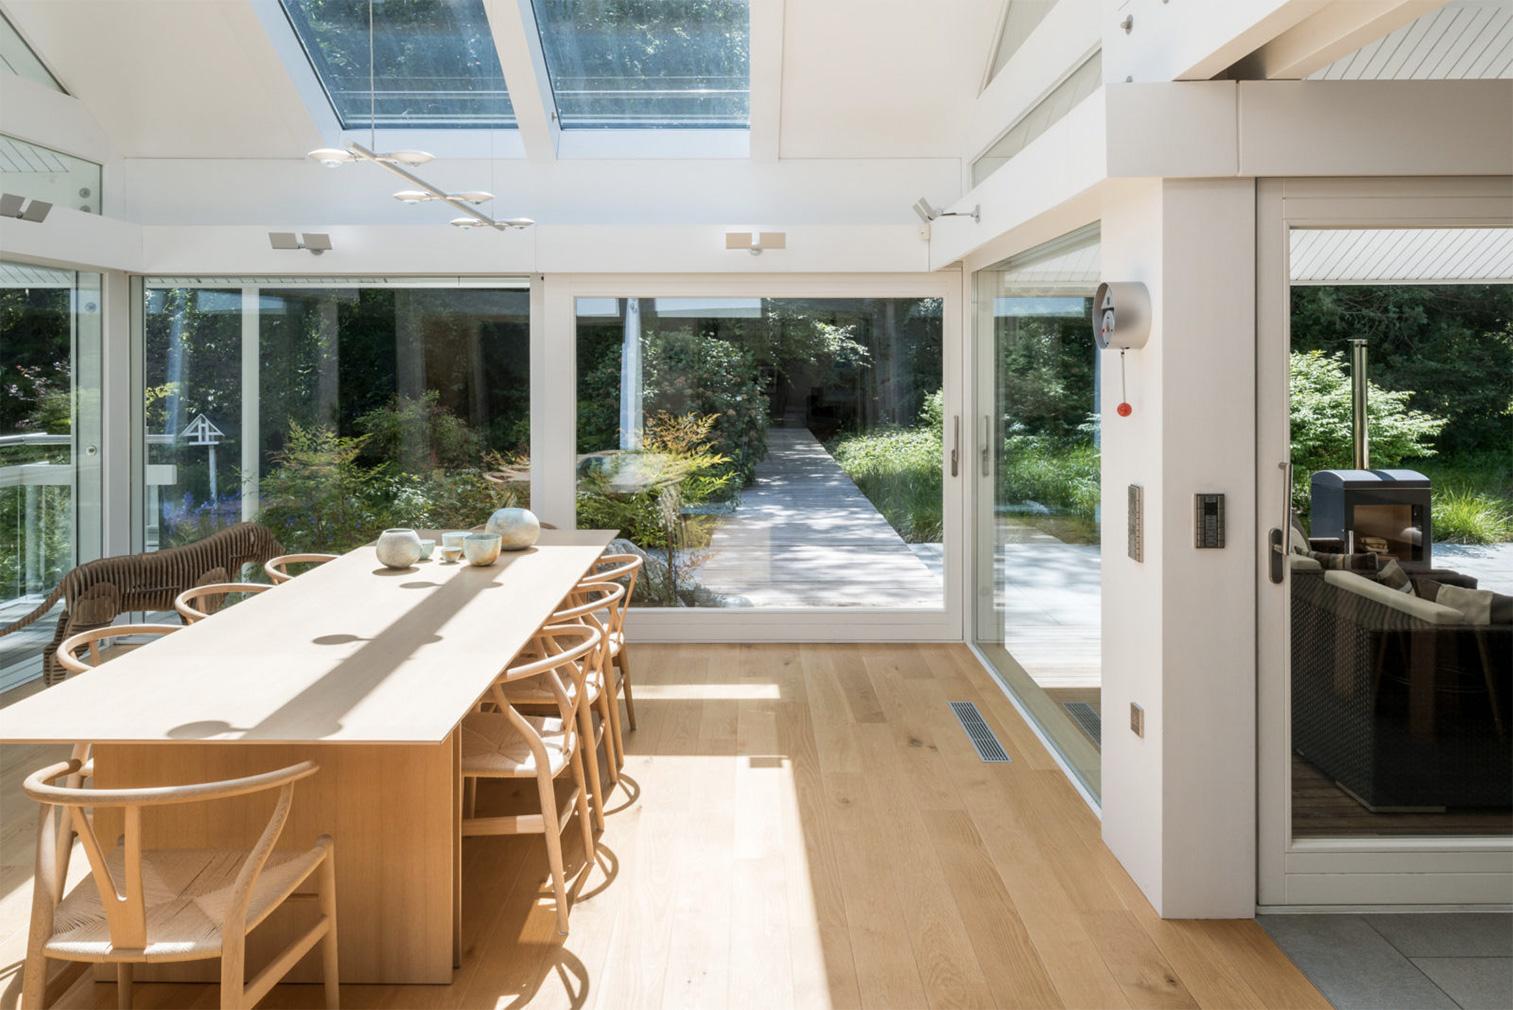 Light-filled Huf House in London's commuter belt asks for £3.6m via The Modern House